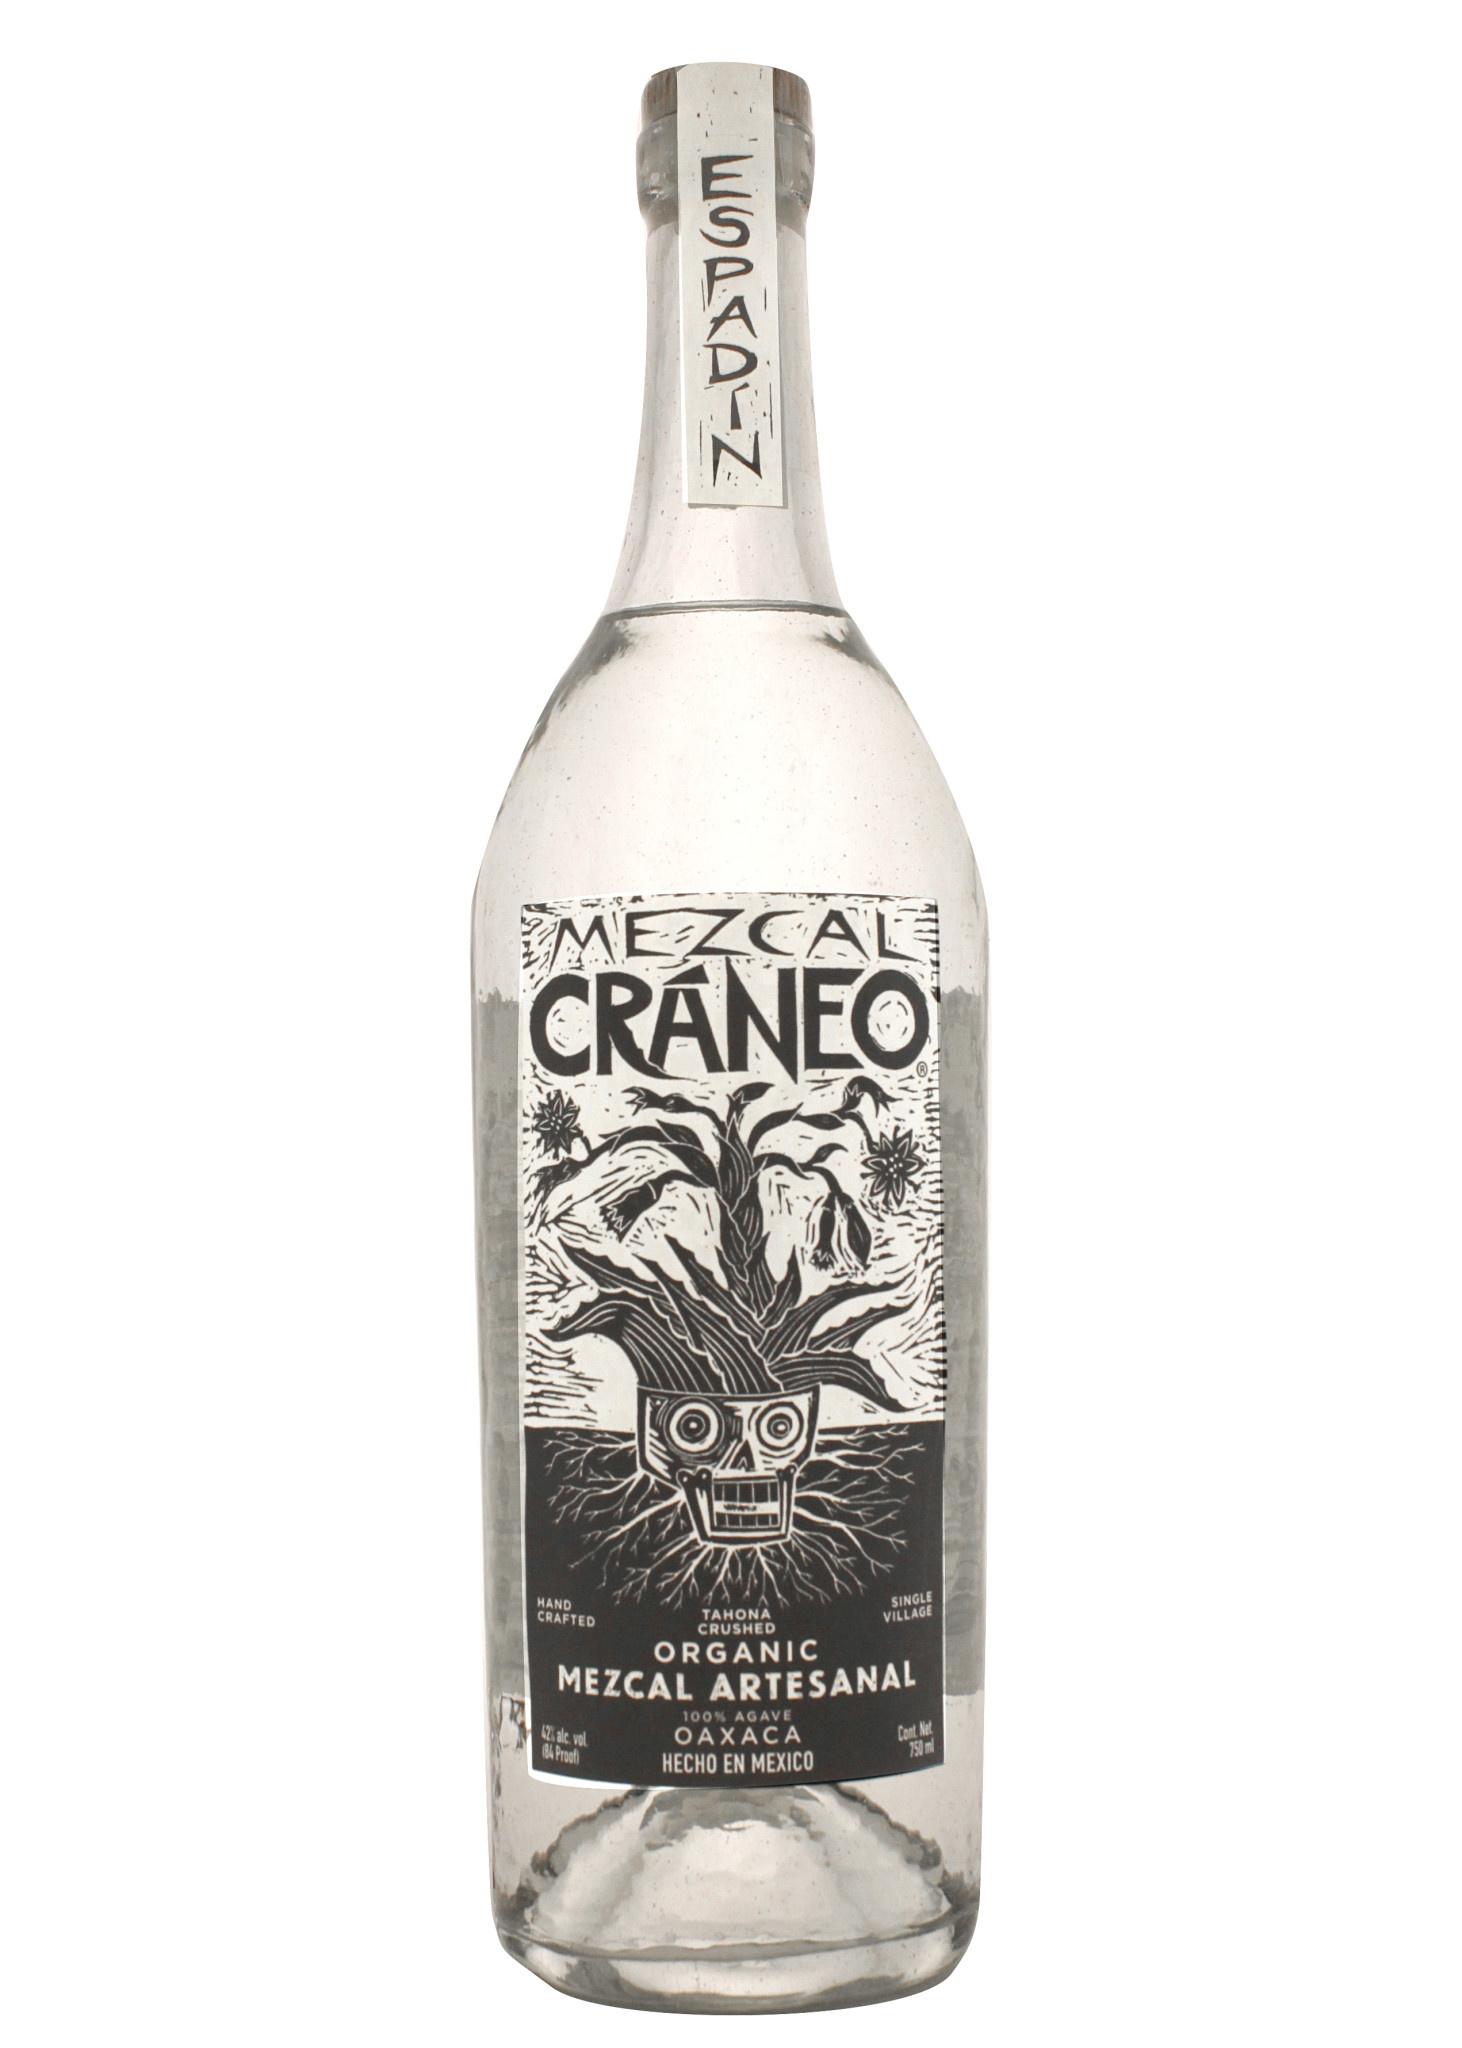 Craneo Organic Mezcal, Oaxaca, Mexico